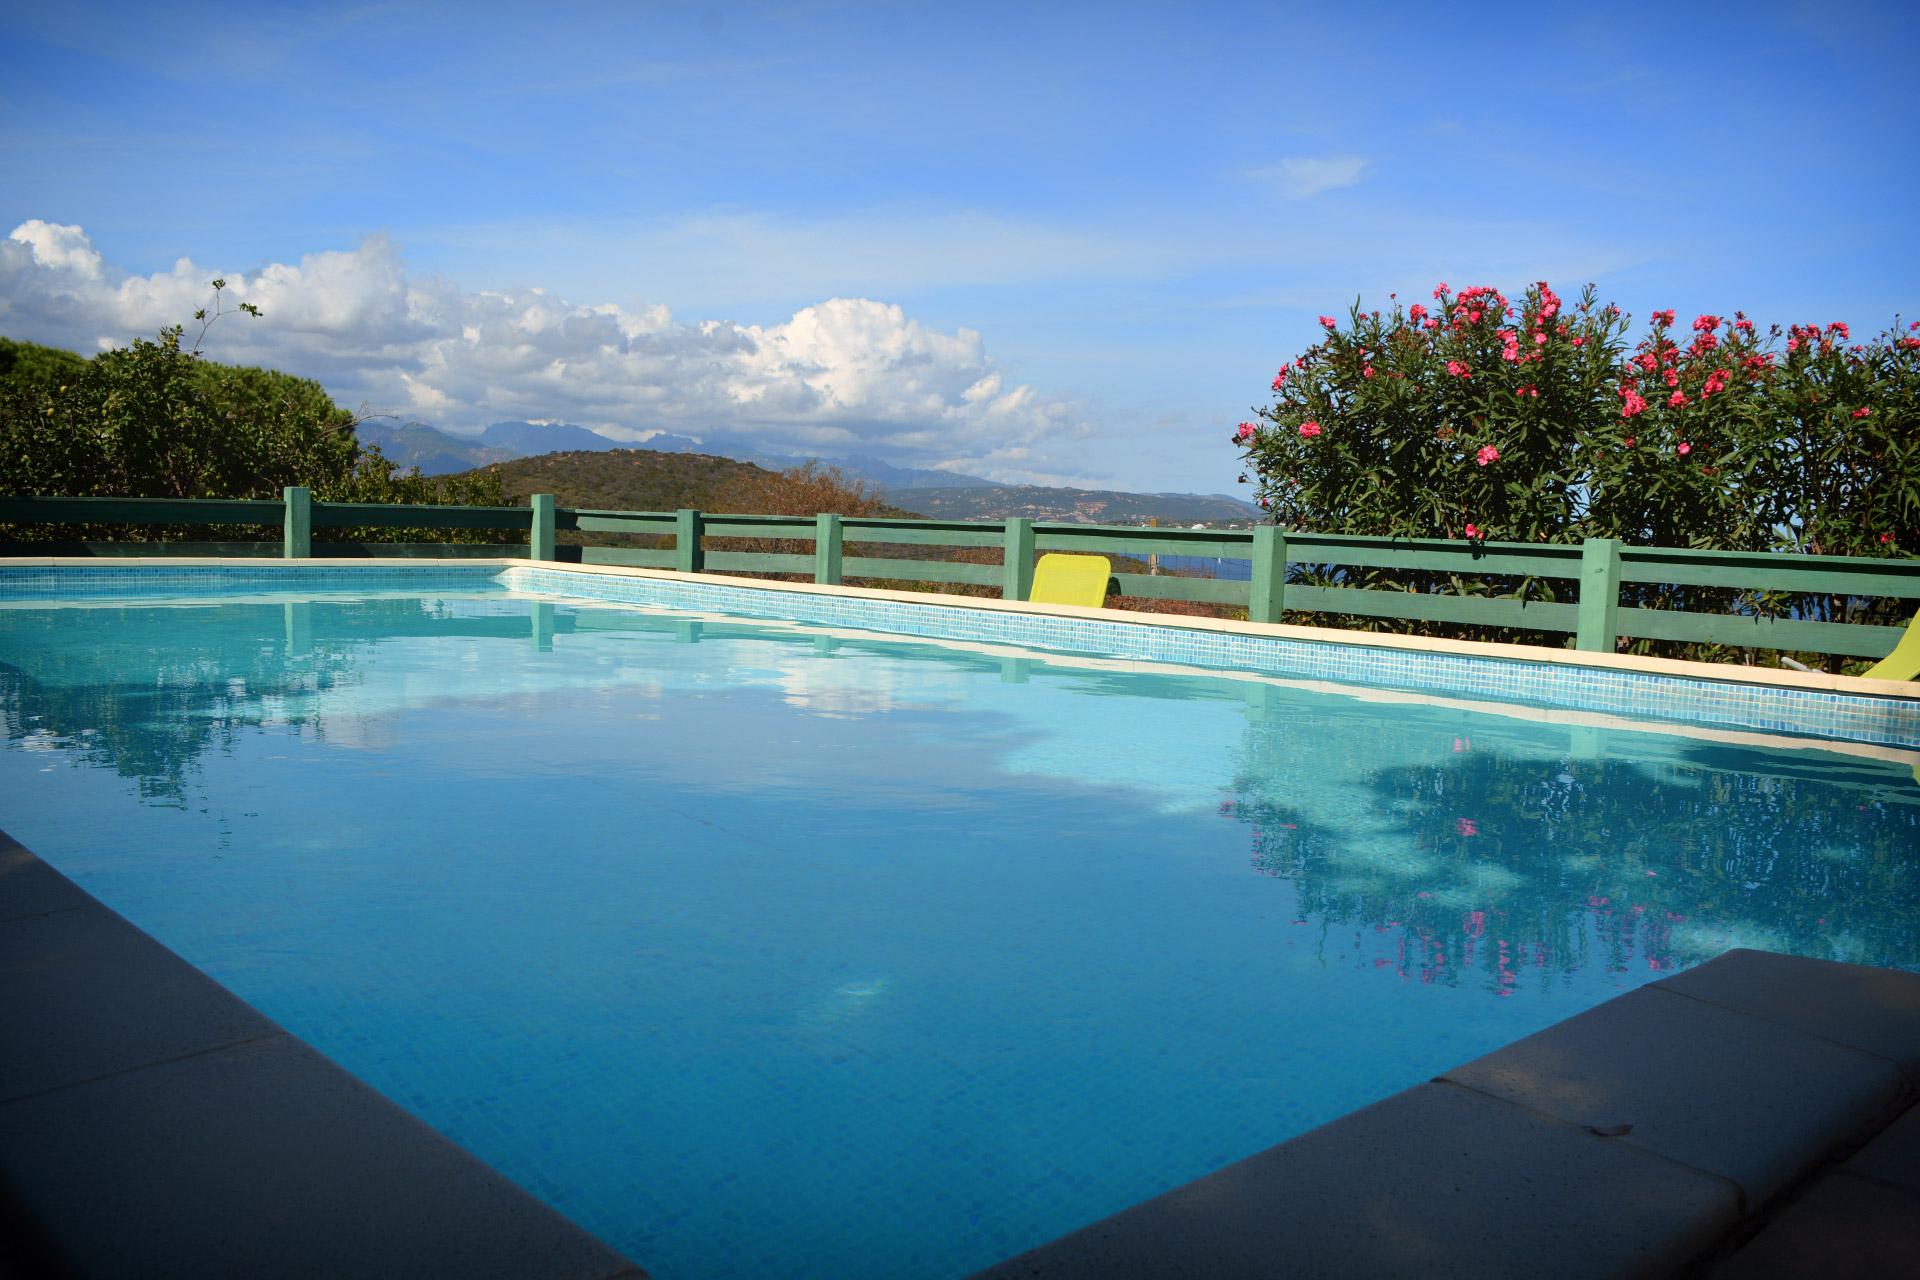 Galerie photo chez marc - Hotel porto portugal avec piscine ...